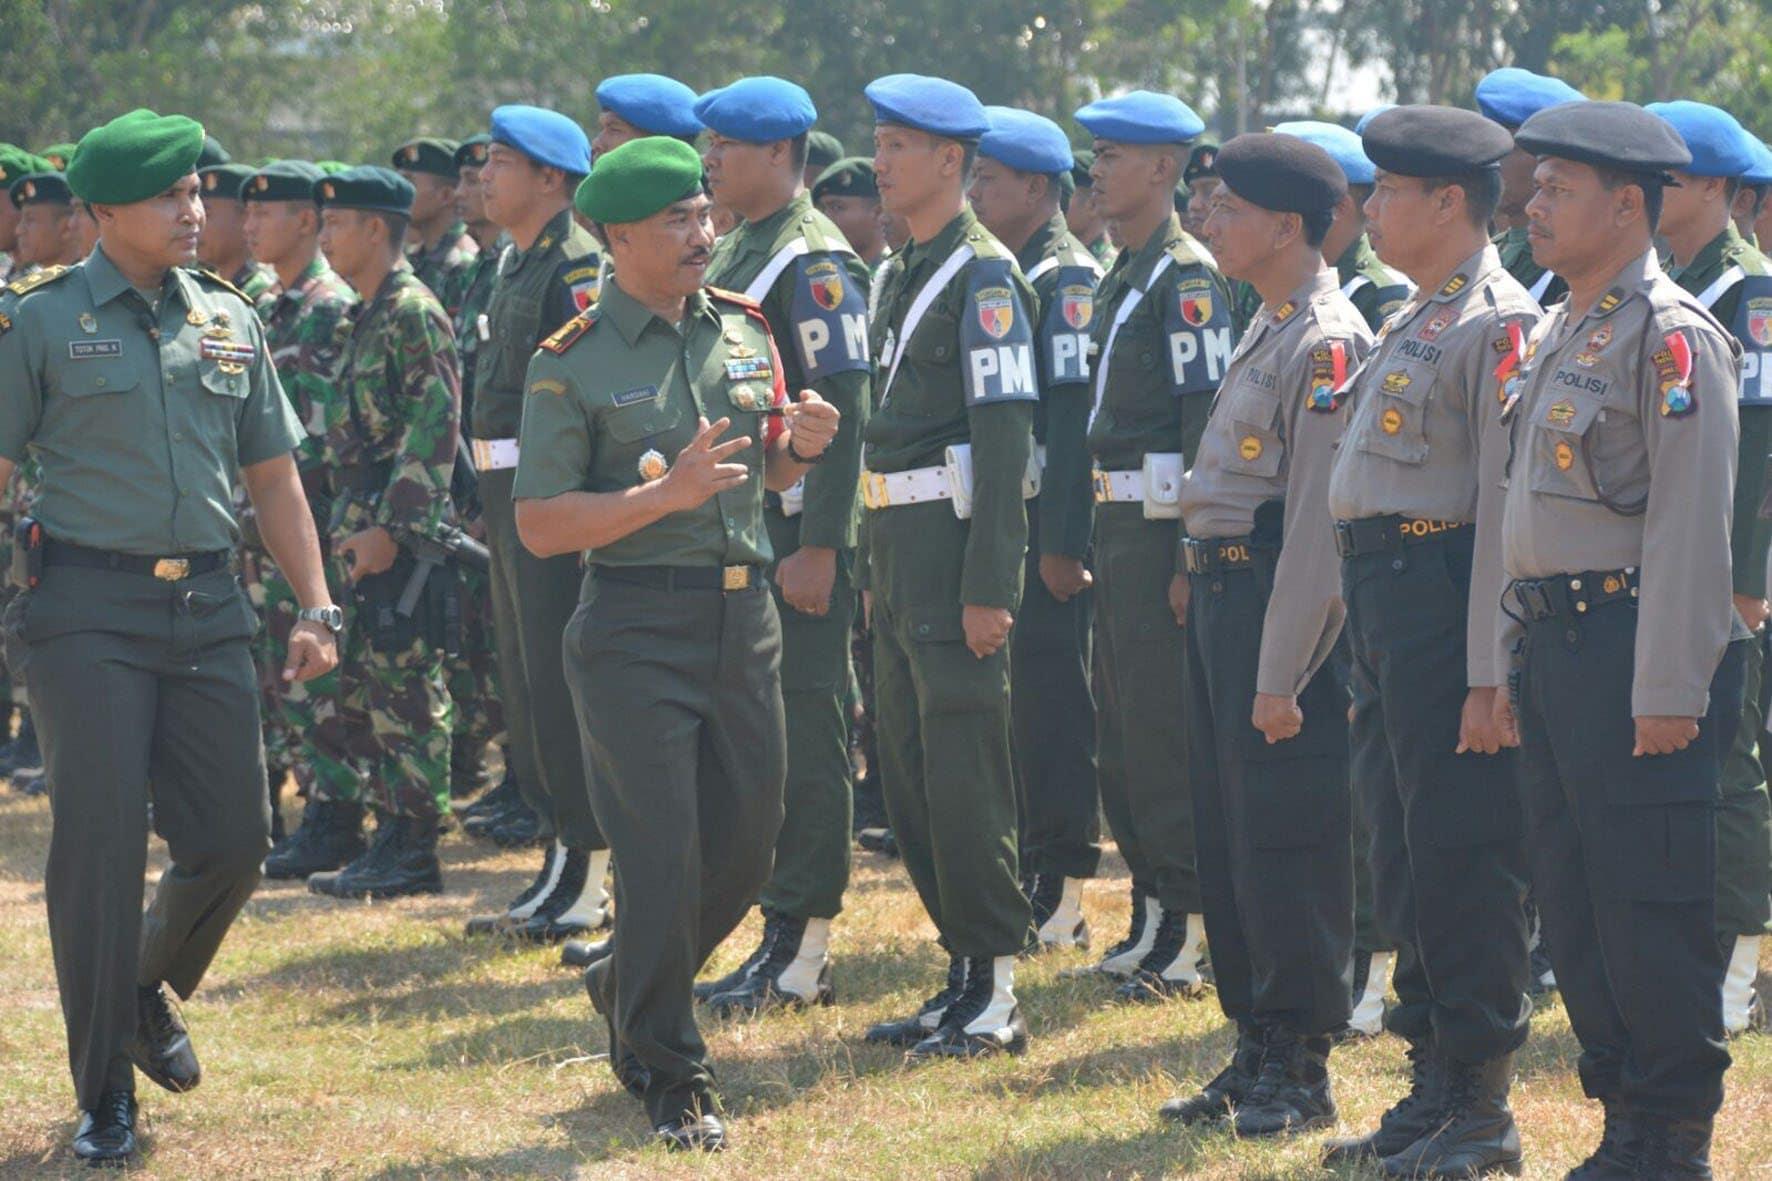 Danrem Kolonel Inf Hardani Lukitanta memeriksa Pasukan (5)